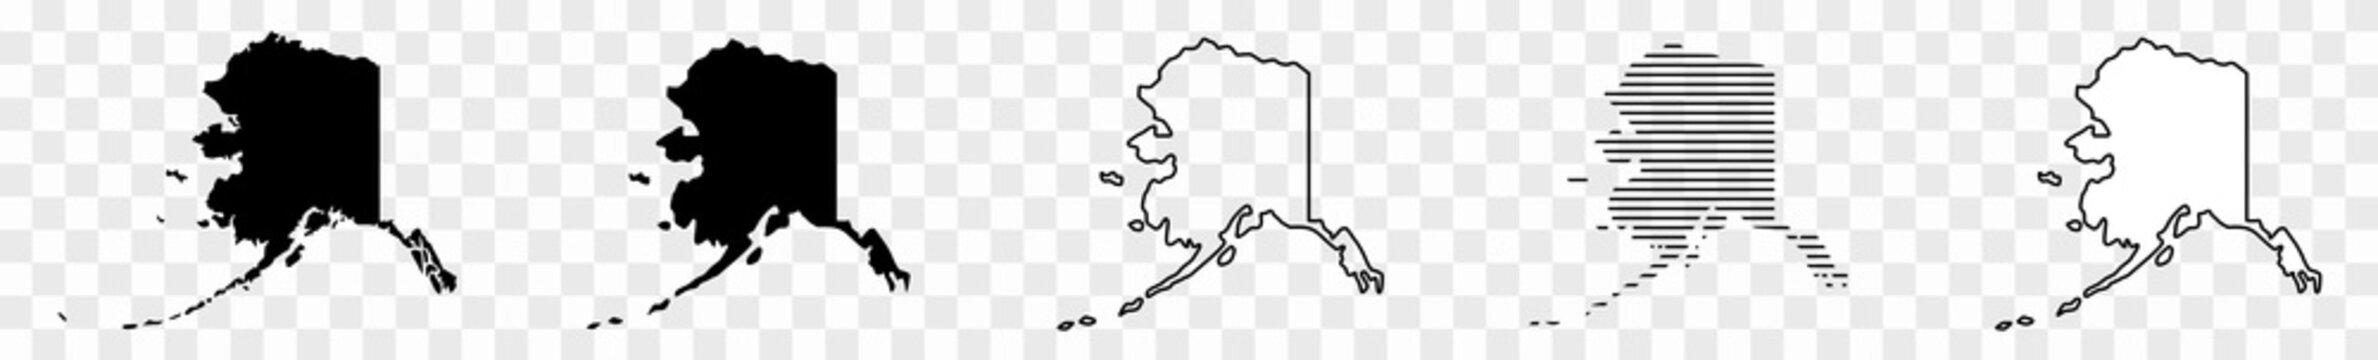 Alaska Map Black | State Border | United States | US America | Transparent Isolated | Variations